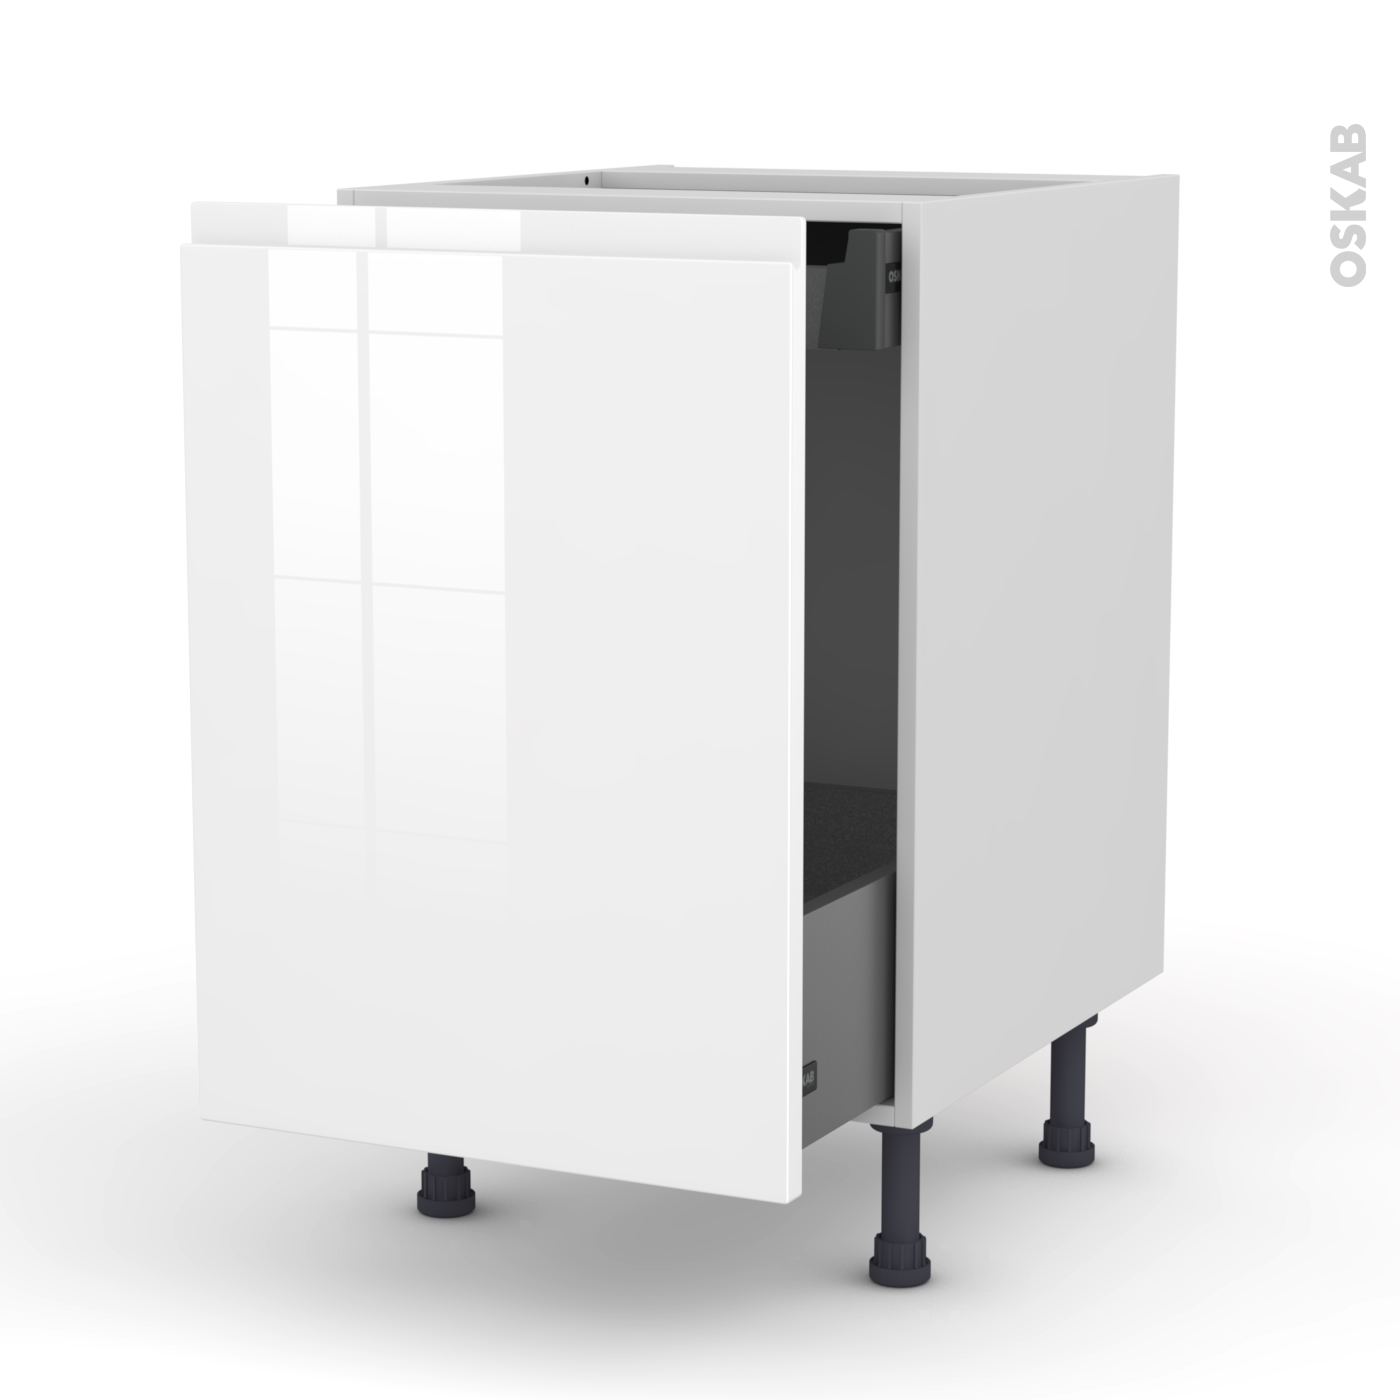 meuble bas plaque de cuisson affordable bas cm porte tiroir master dcor imitation chne with. Black Bedroom Furniture Sets. Home Design Ideas